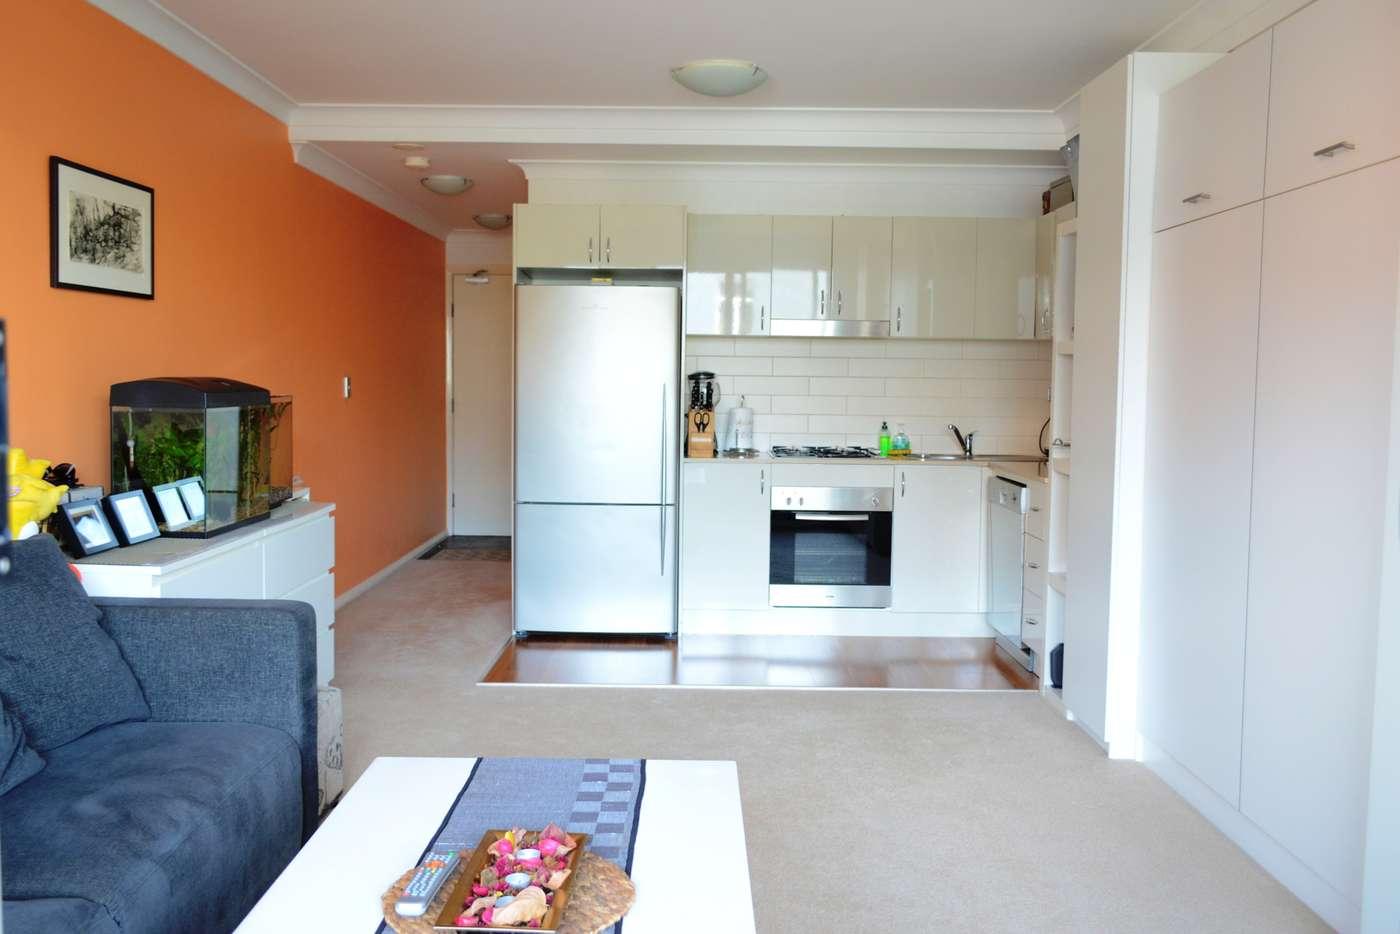 Main view of Homely studio listing, 15/21 Regent Street, Redfern NSW 2016